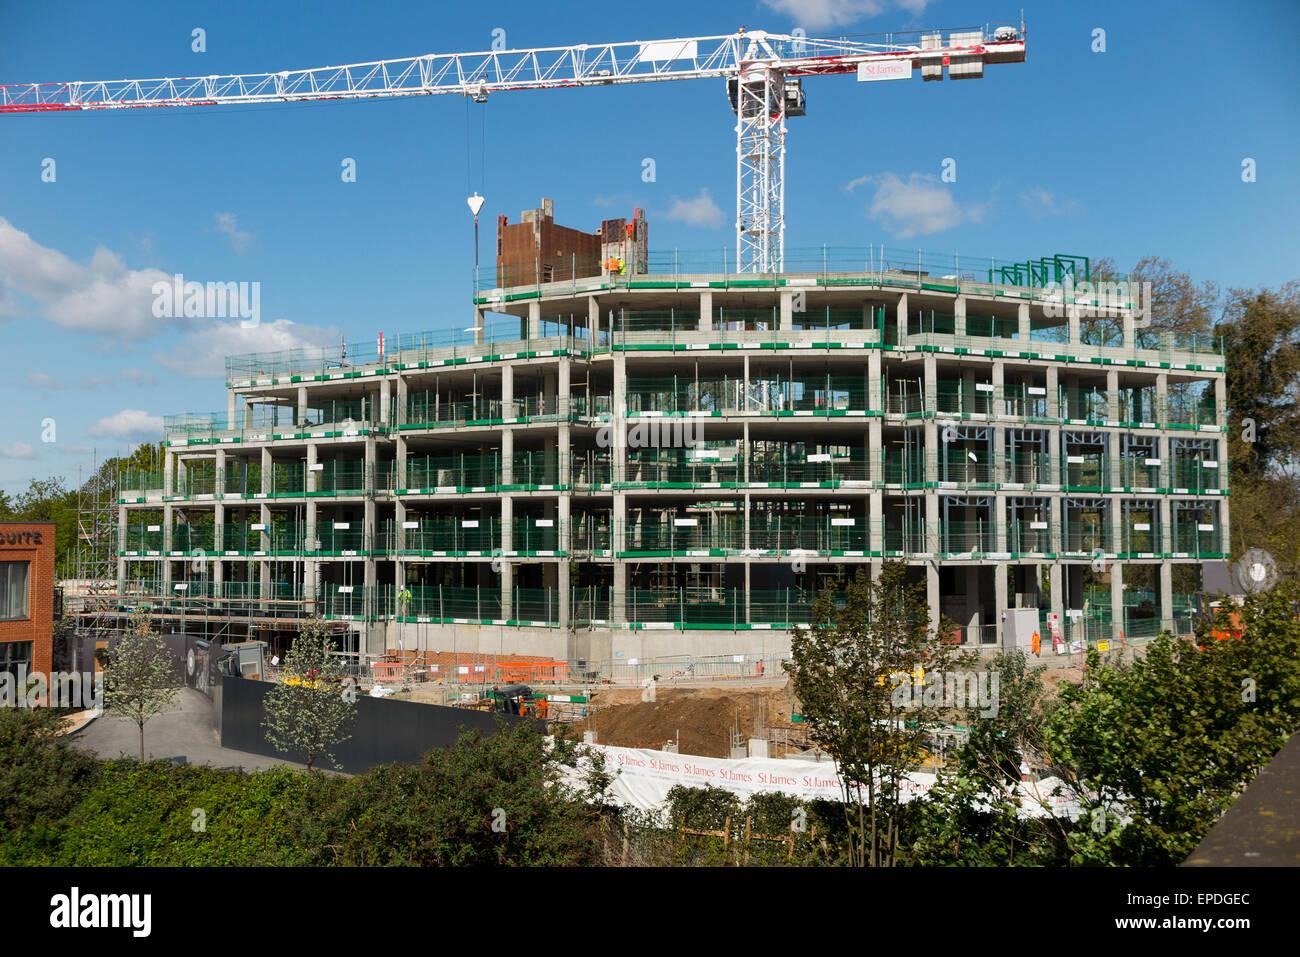 construction site exterior partly built housing block new construction site exterior partly built housing block new build building apartment block apartments flat flats uk